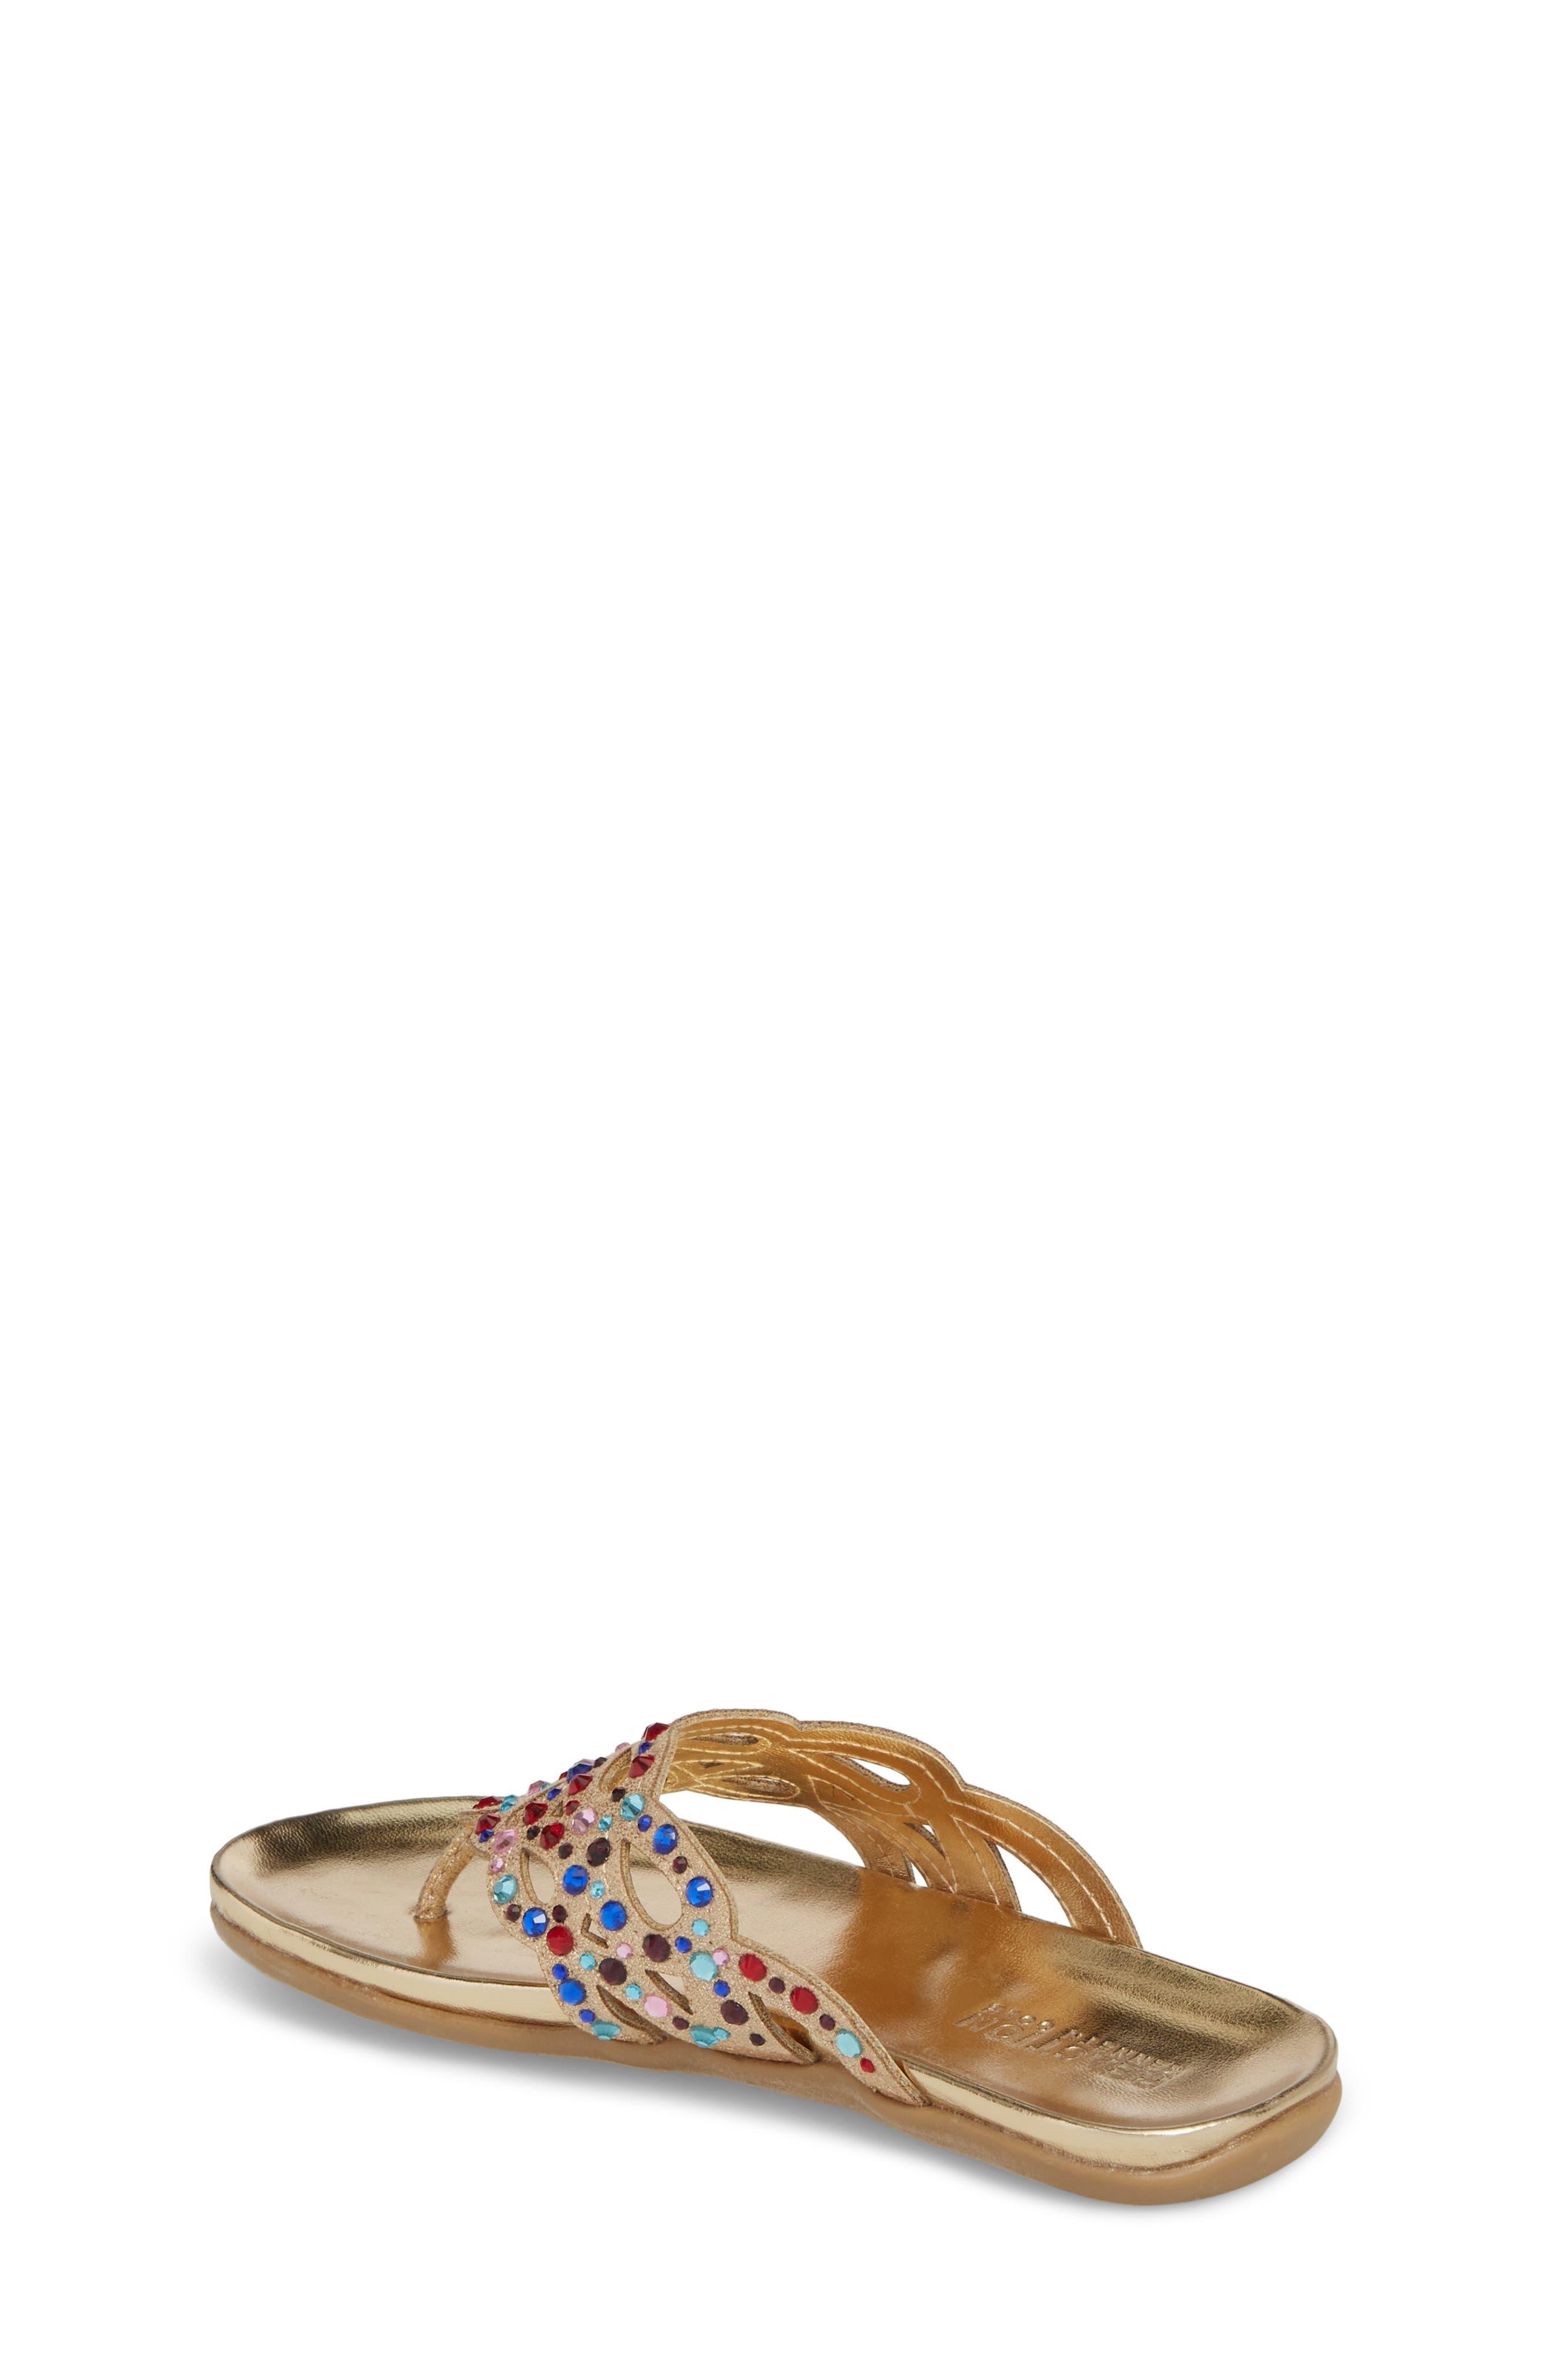 Kenneth Cole New York Flutter Metallic Crystal Thong Sandal,                             Alternate thumbnail 2, color,                             Gold Multi